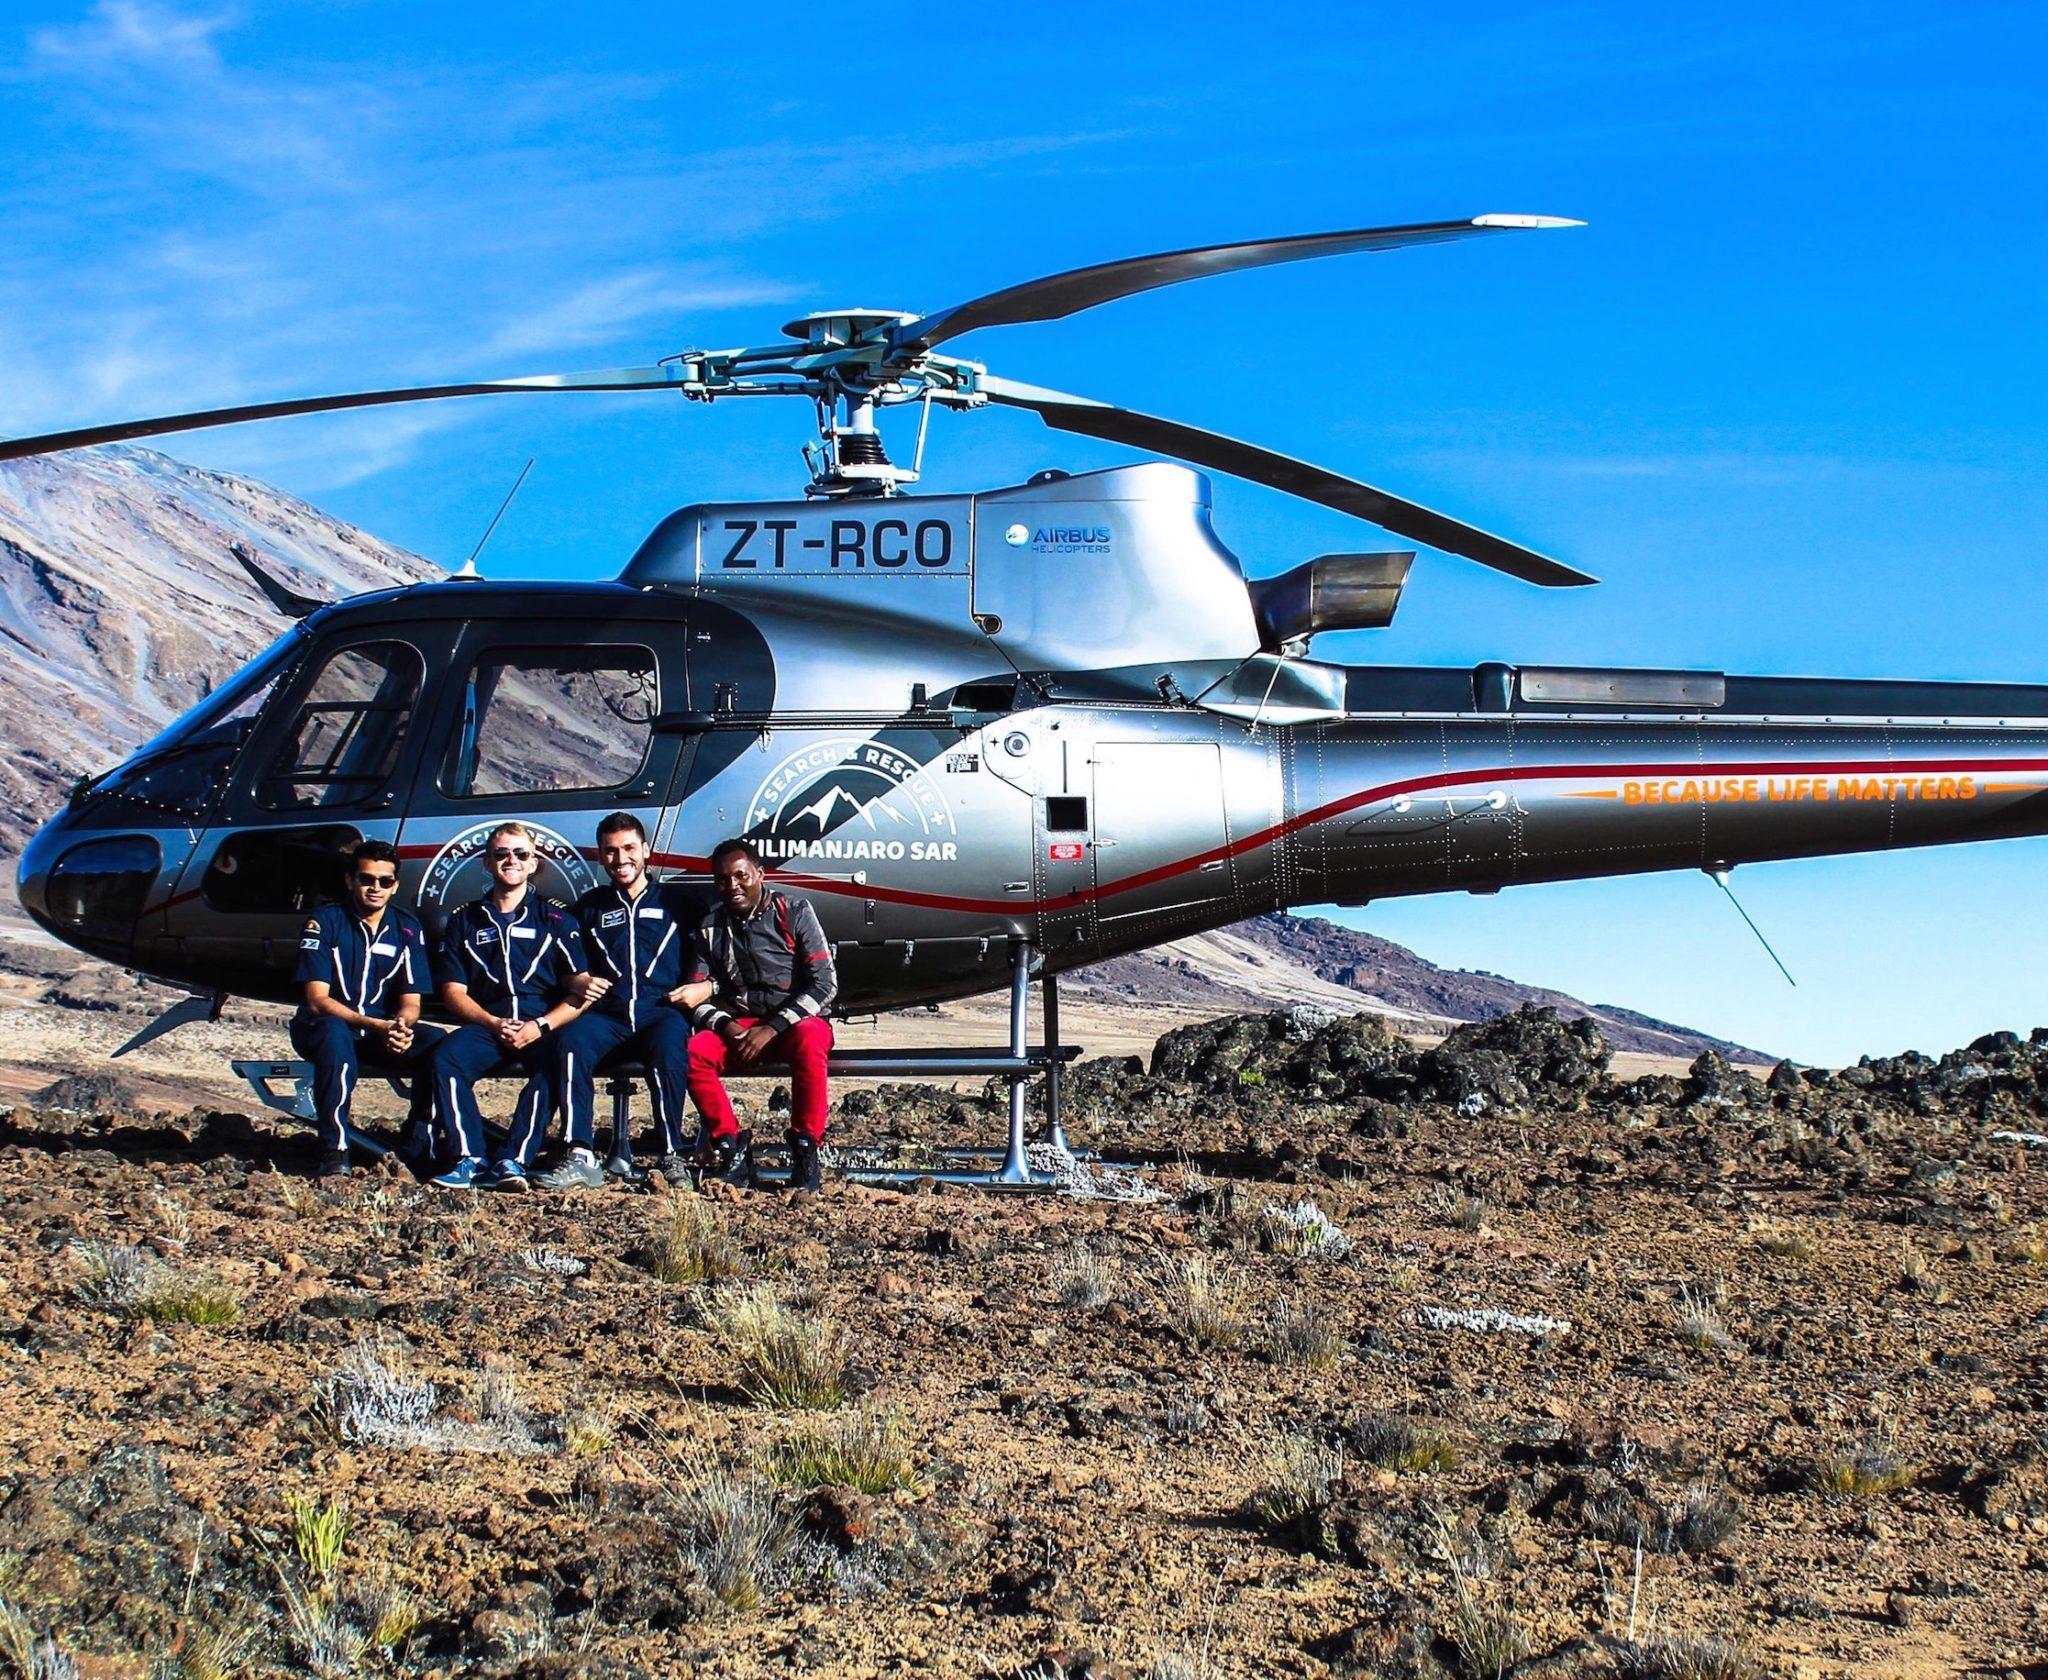 Scenic Mount Kilimanjaro helicopter flight in Tanzania